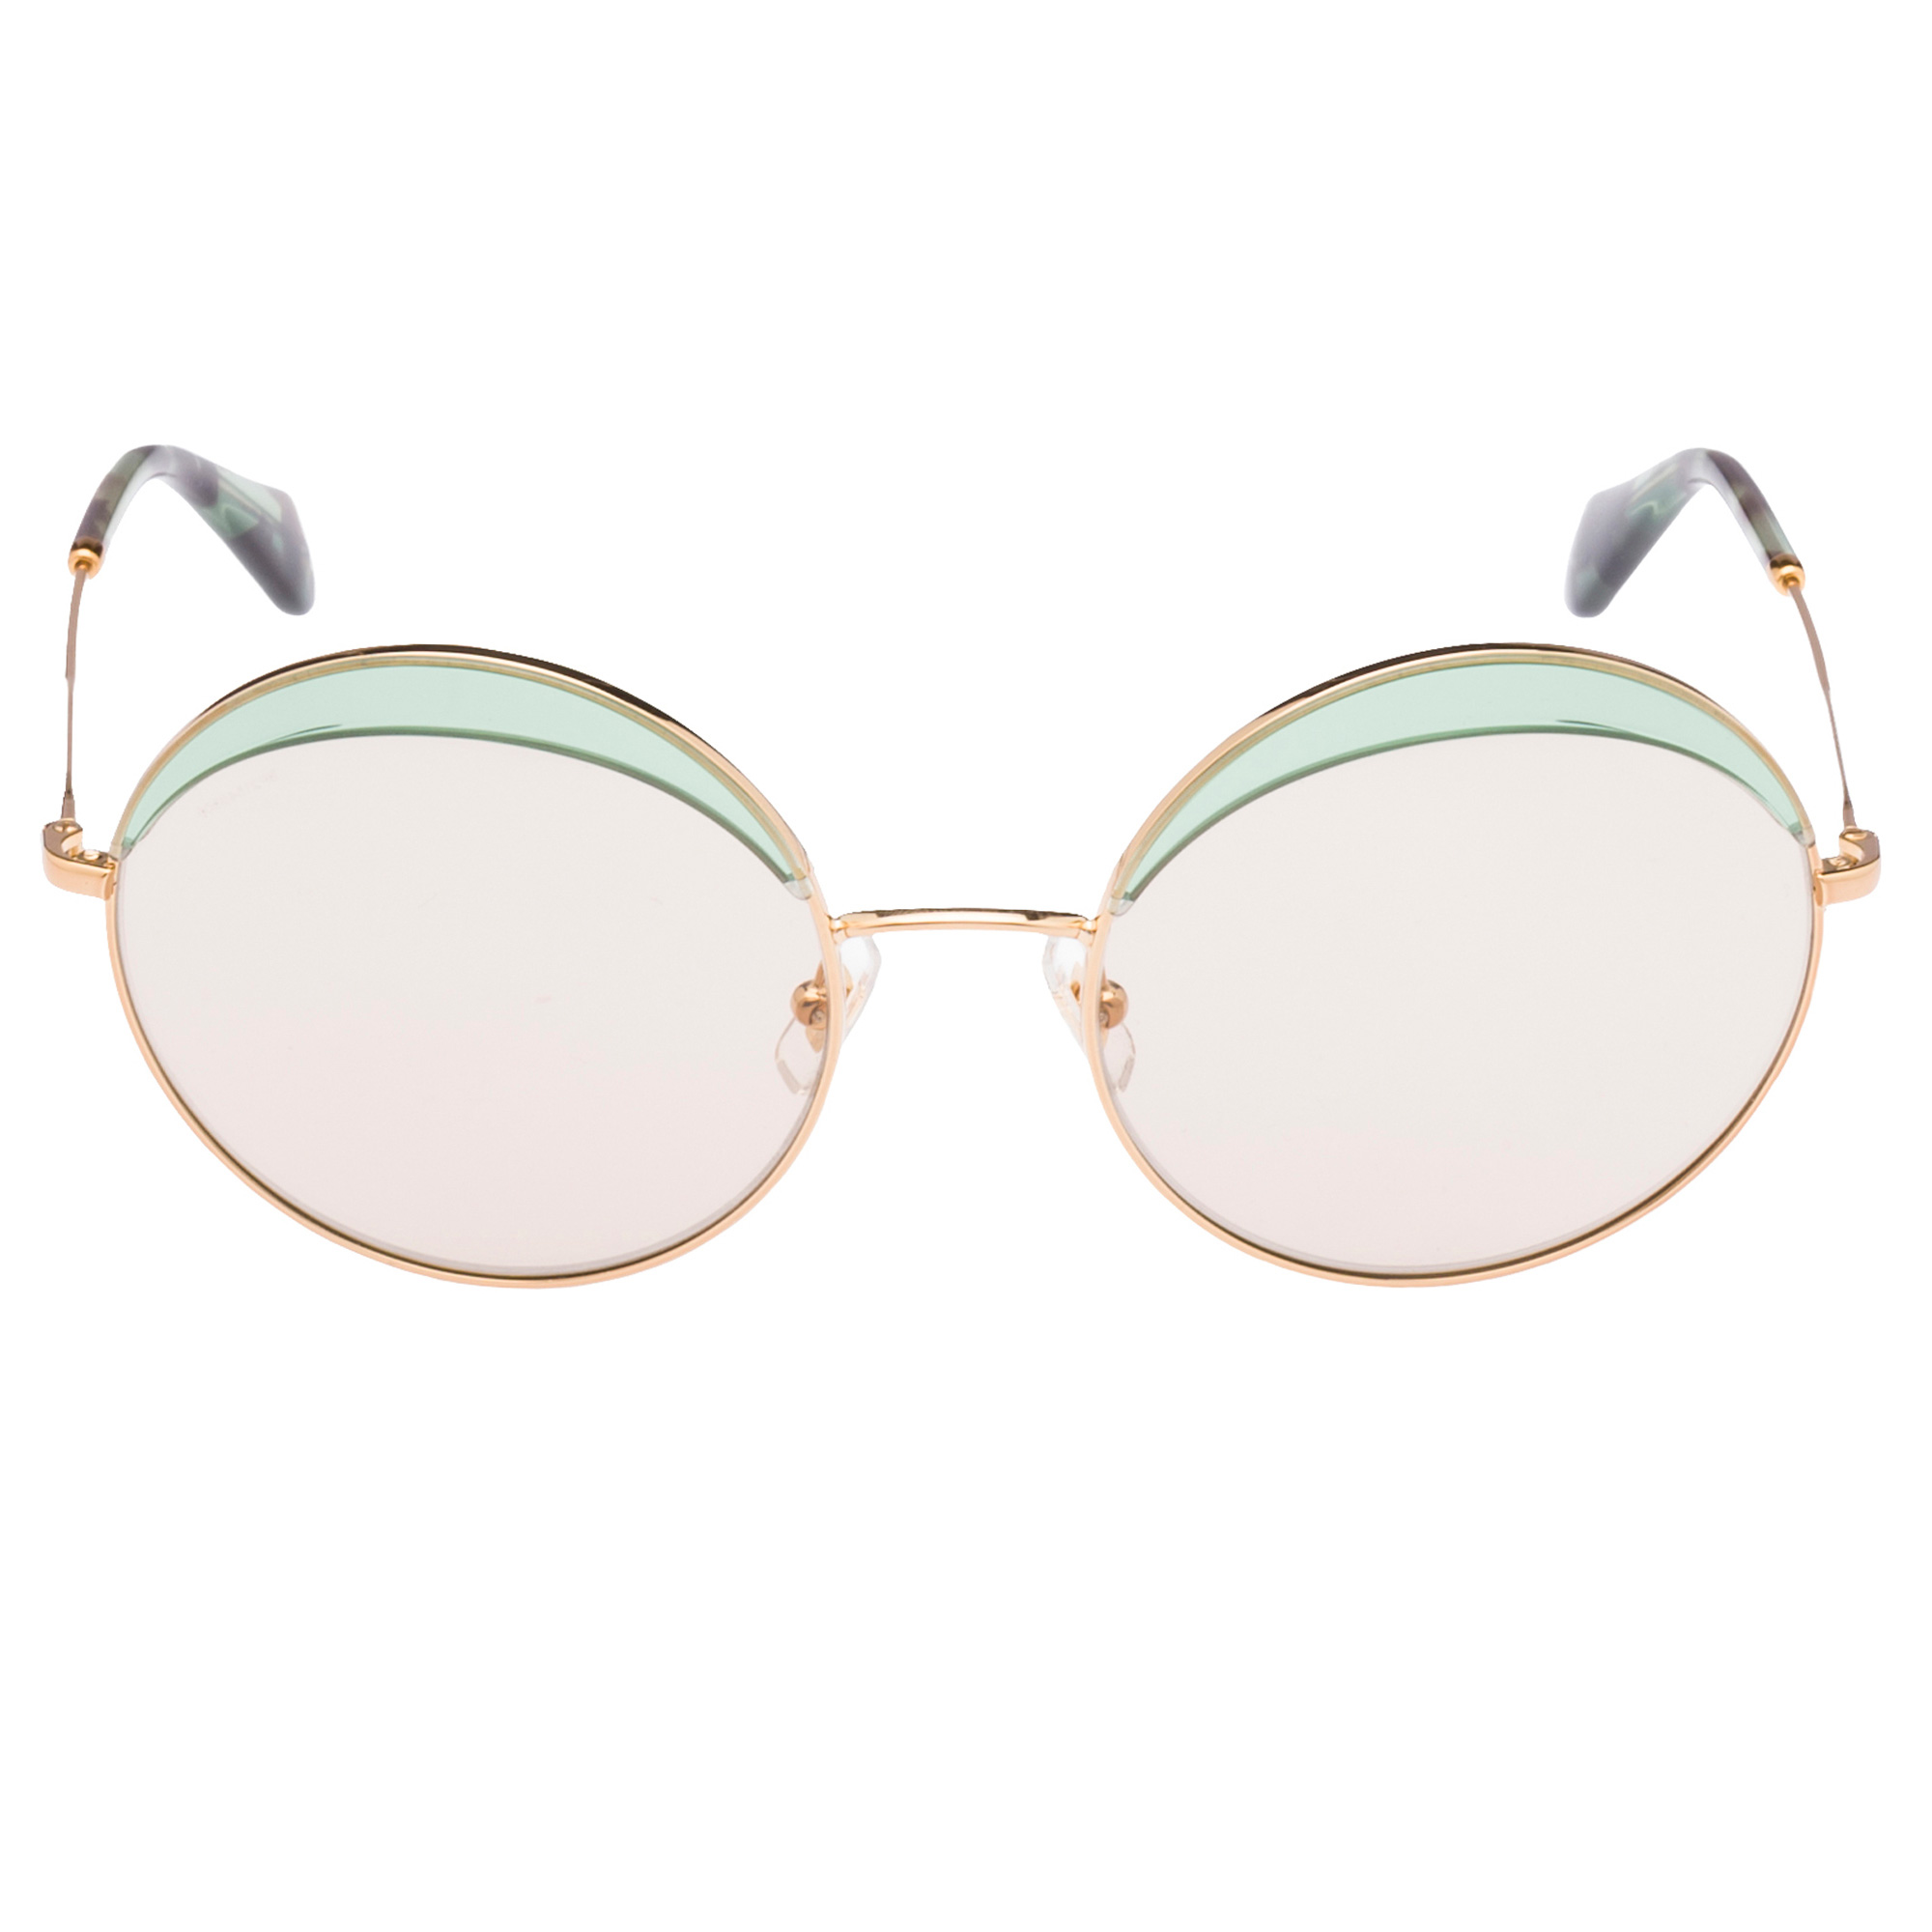 Store · eyewear · metal · sunglasses smu51q_etwn_f04i2